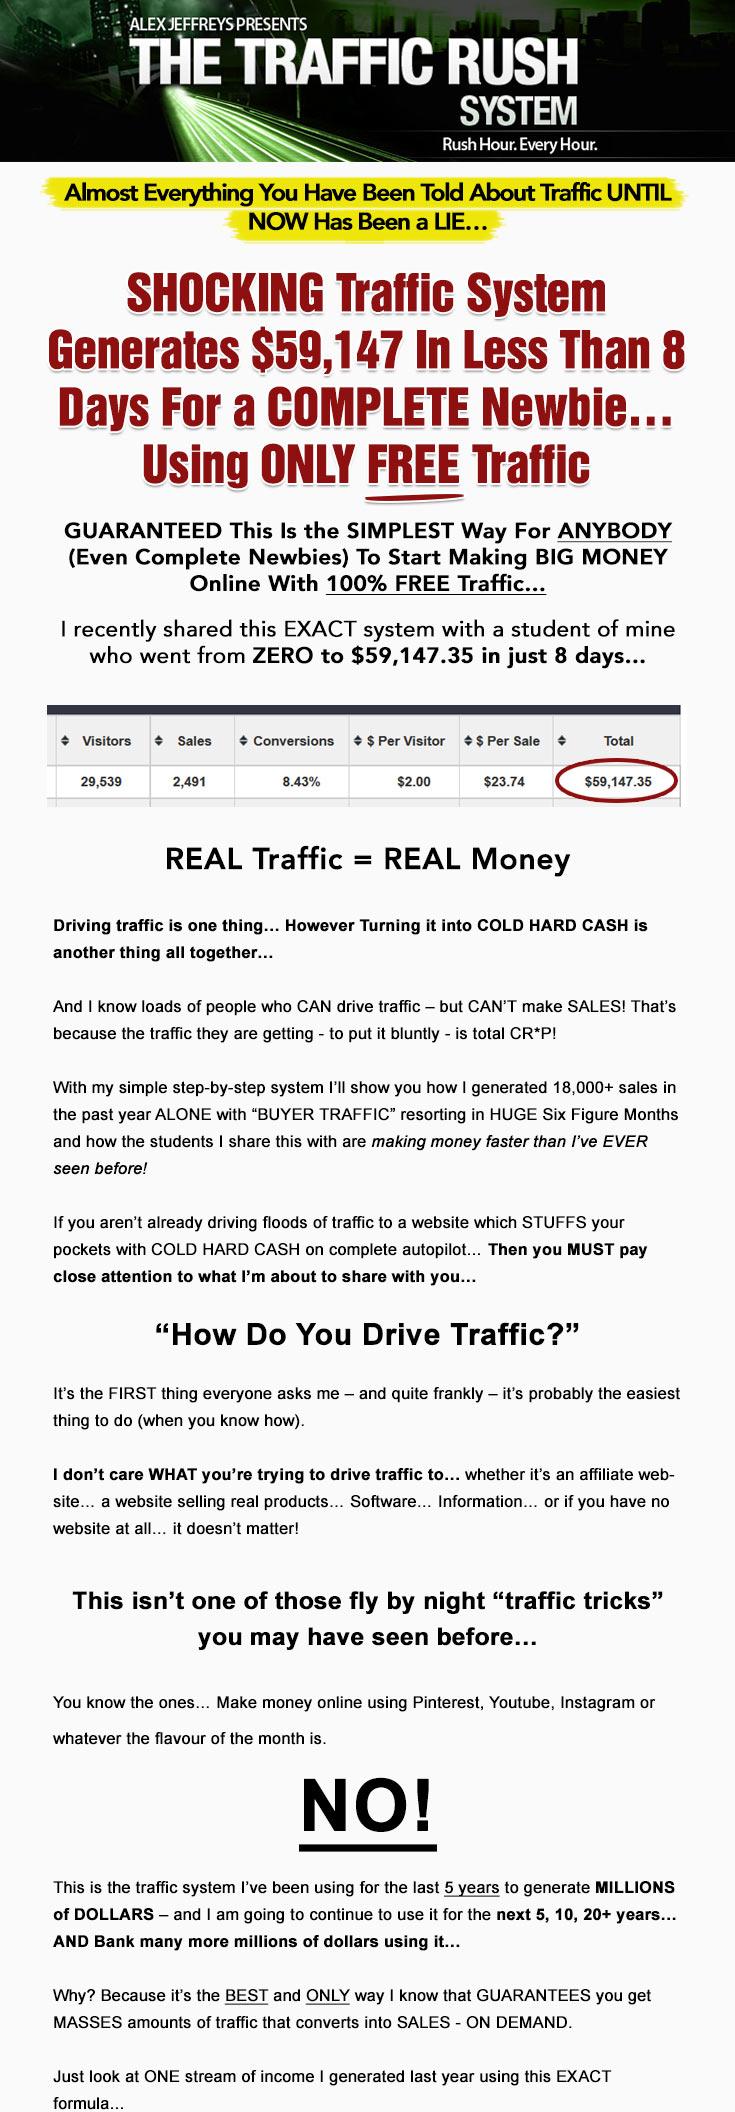 Traffic Rush System by Alex Jeffreys – Value $9.95